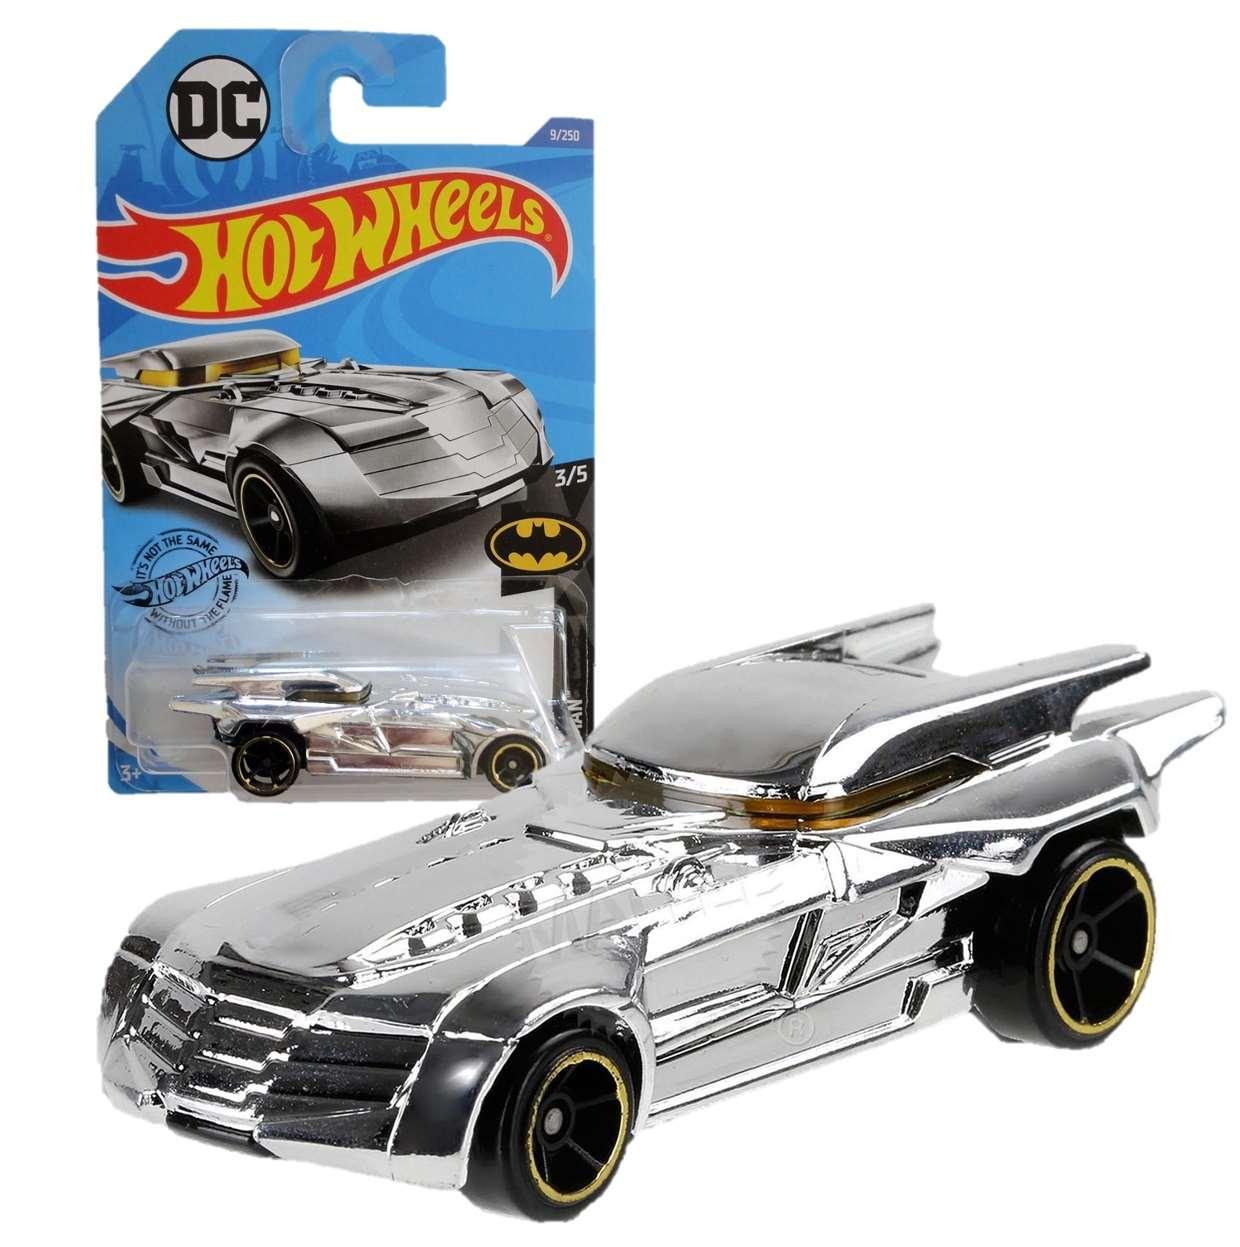 Batmobile Chrome Gray 3/5 Batman Dc Hot Wheels 9/250